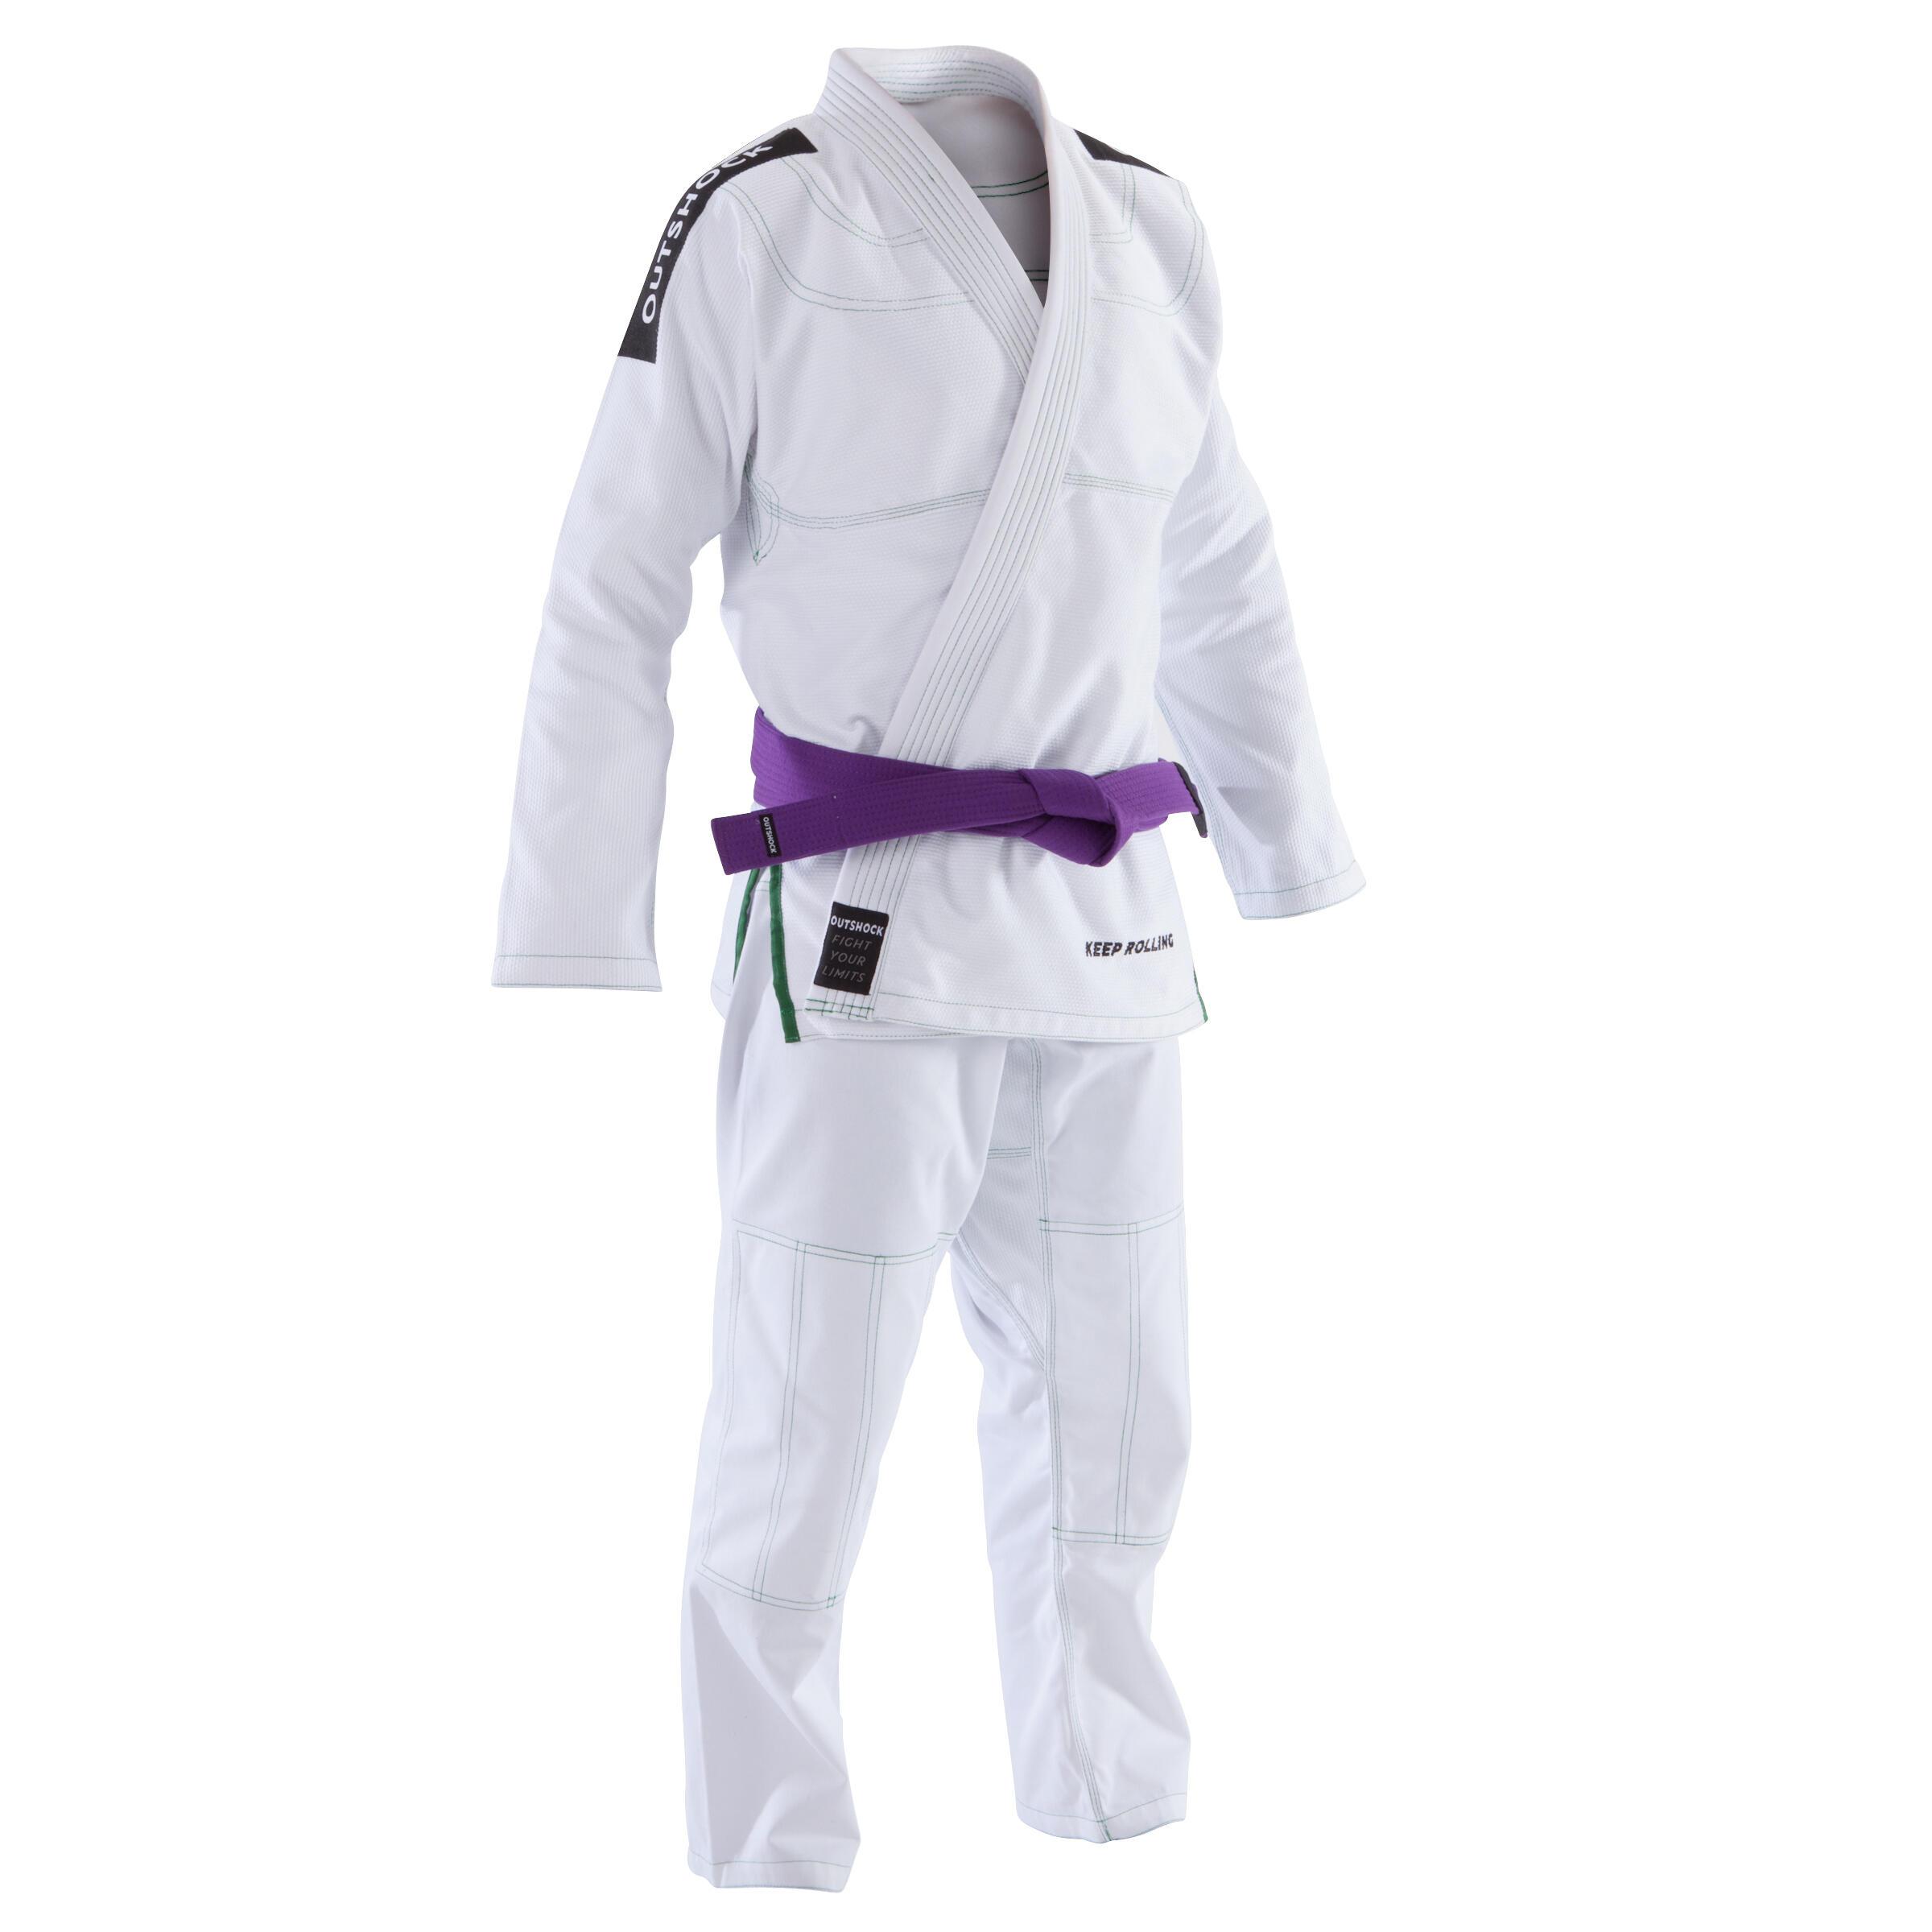 Kimono JJB 500 Alb Adulți imagine